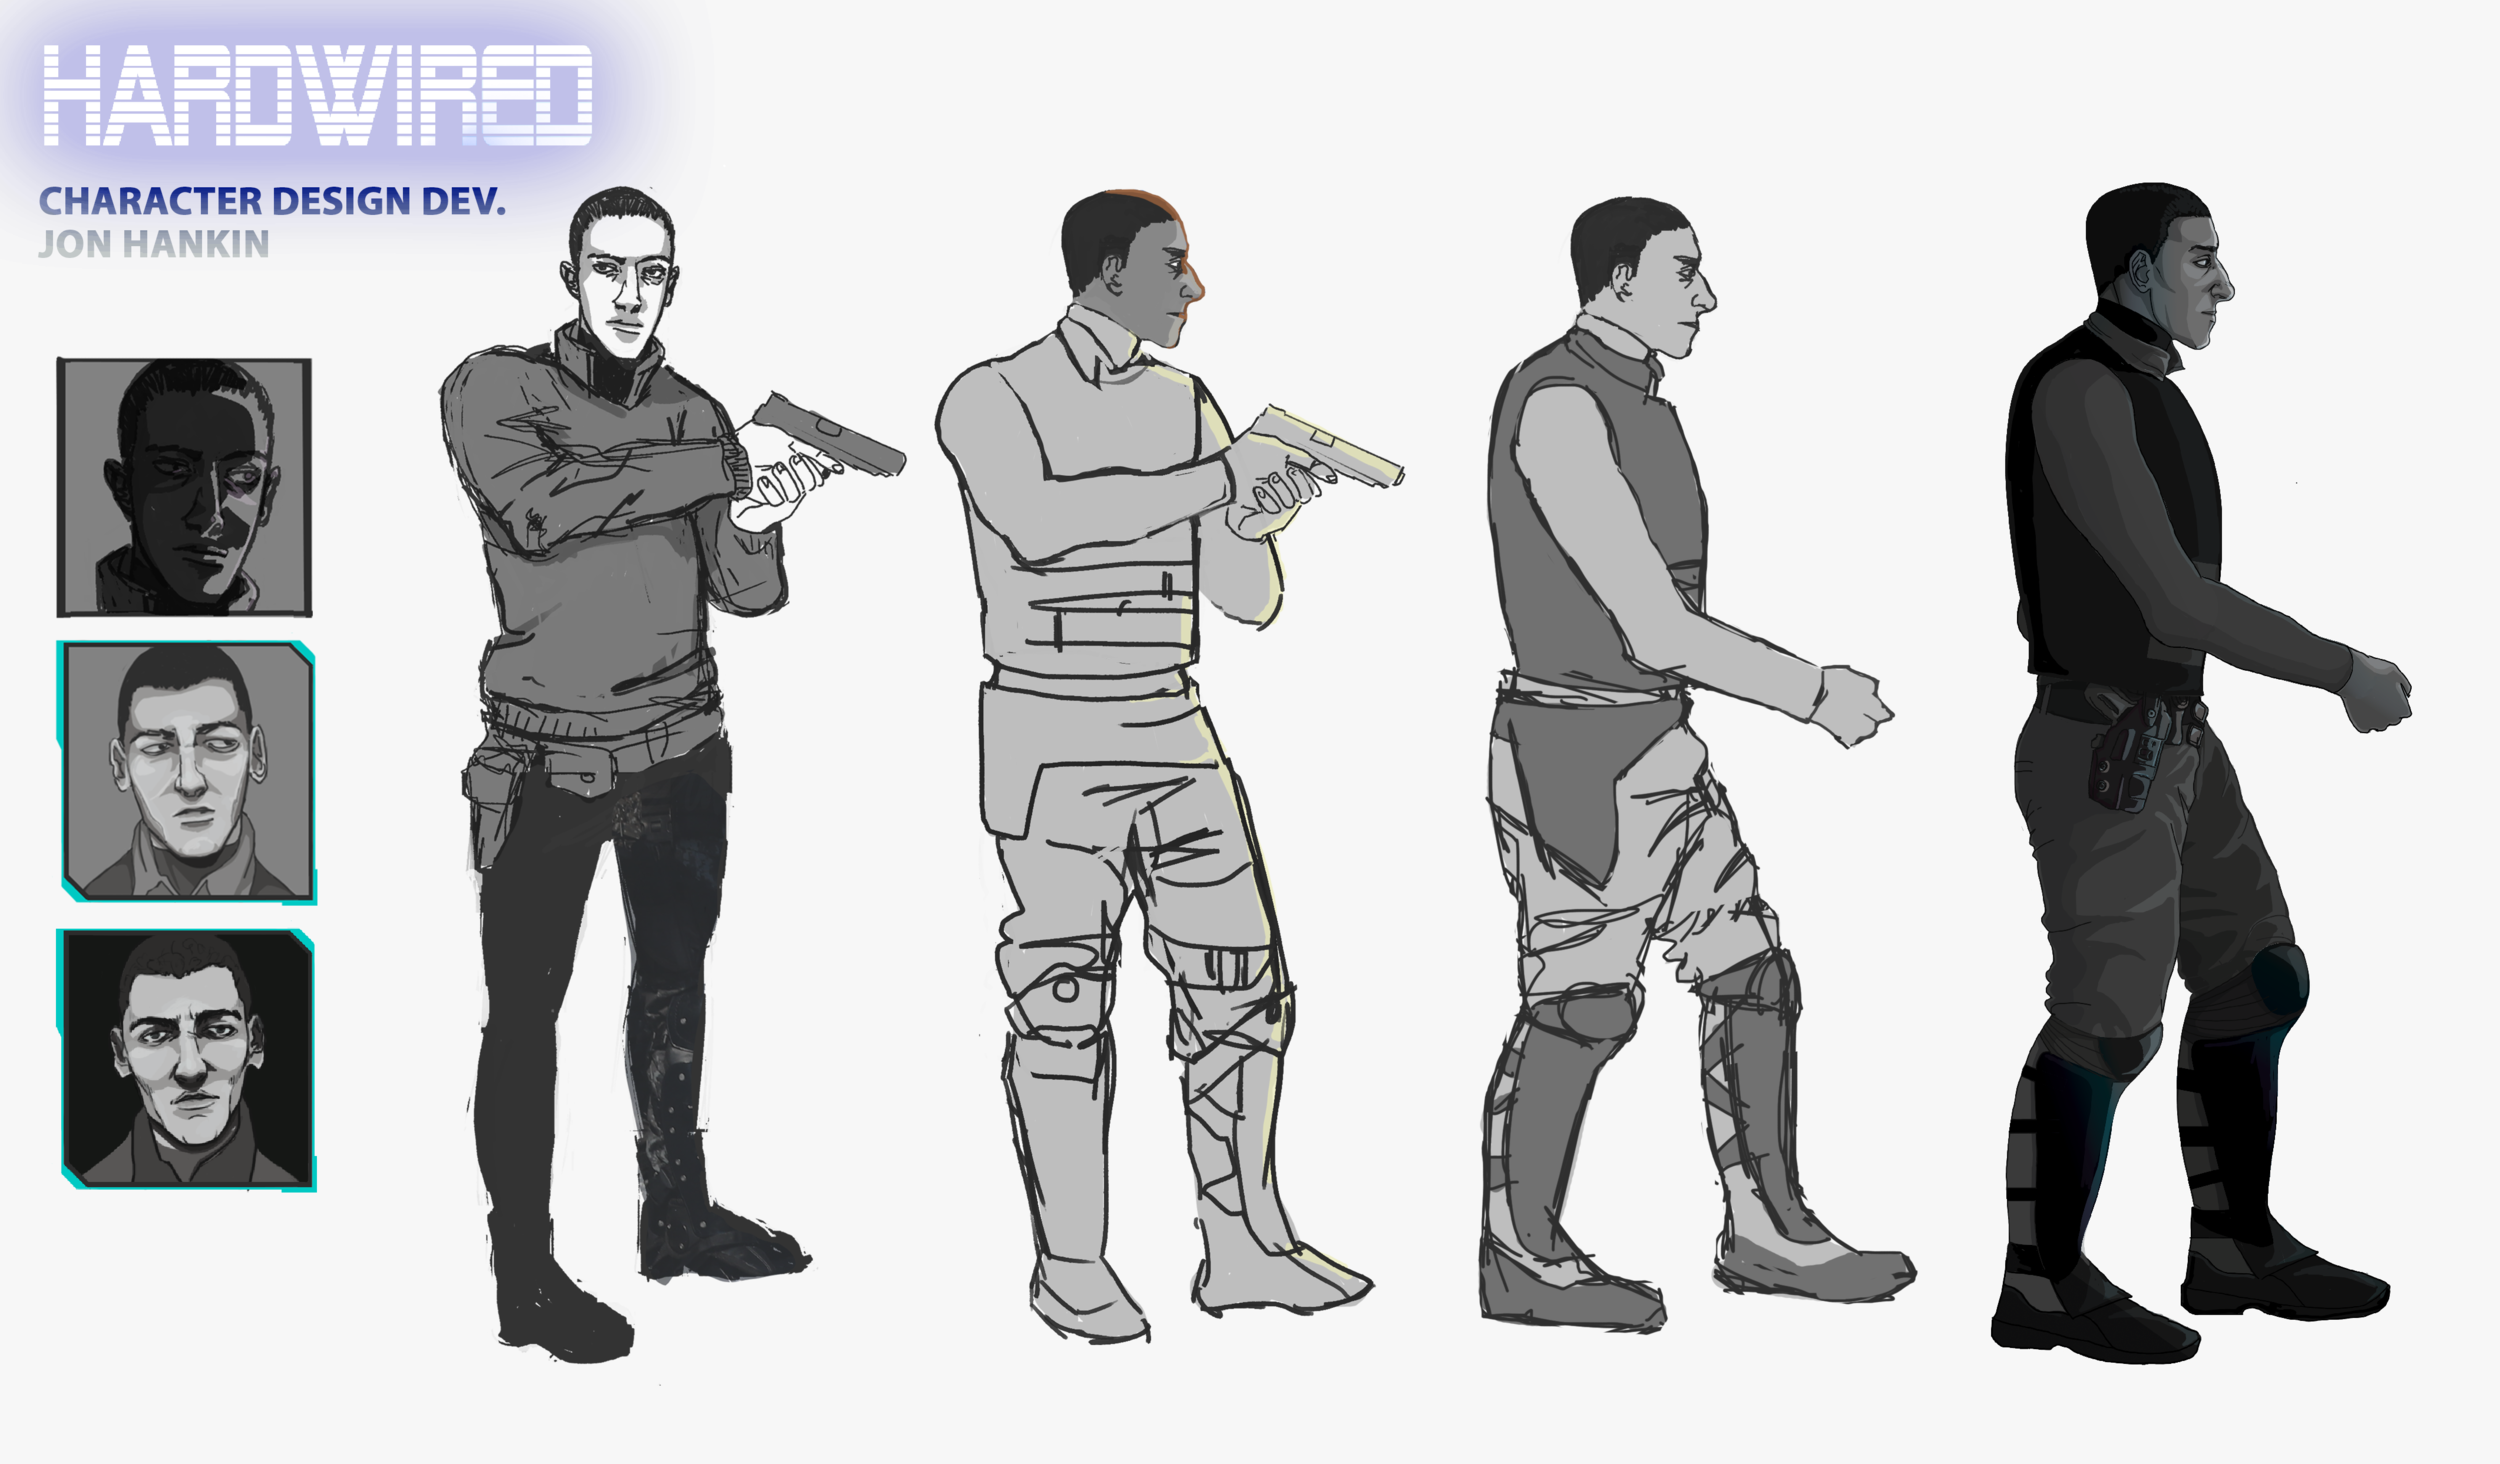 Character Design Sheet - Jon Hankin by Adela Kapuścińska. 2017.